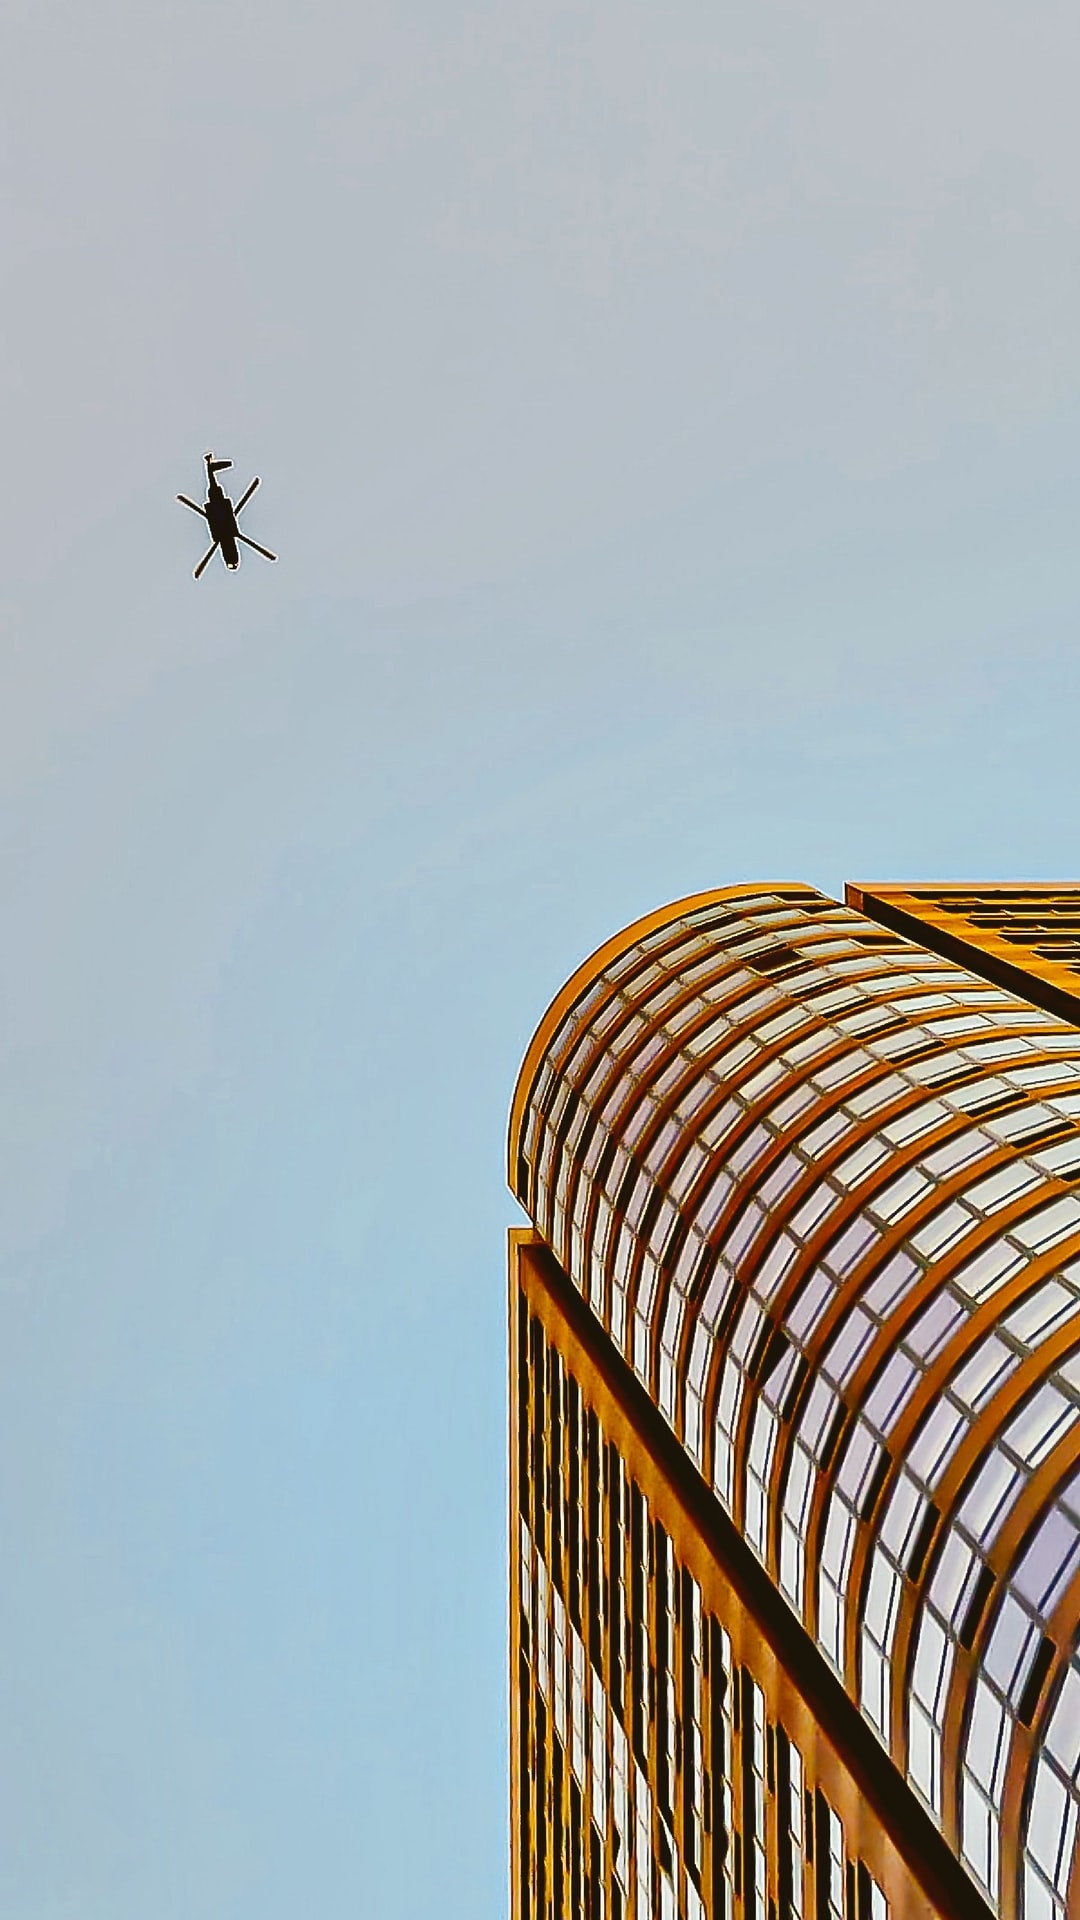 Helicopter flying over Manhattan on Sept 11. 2019.